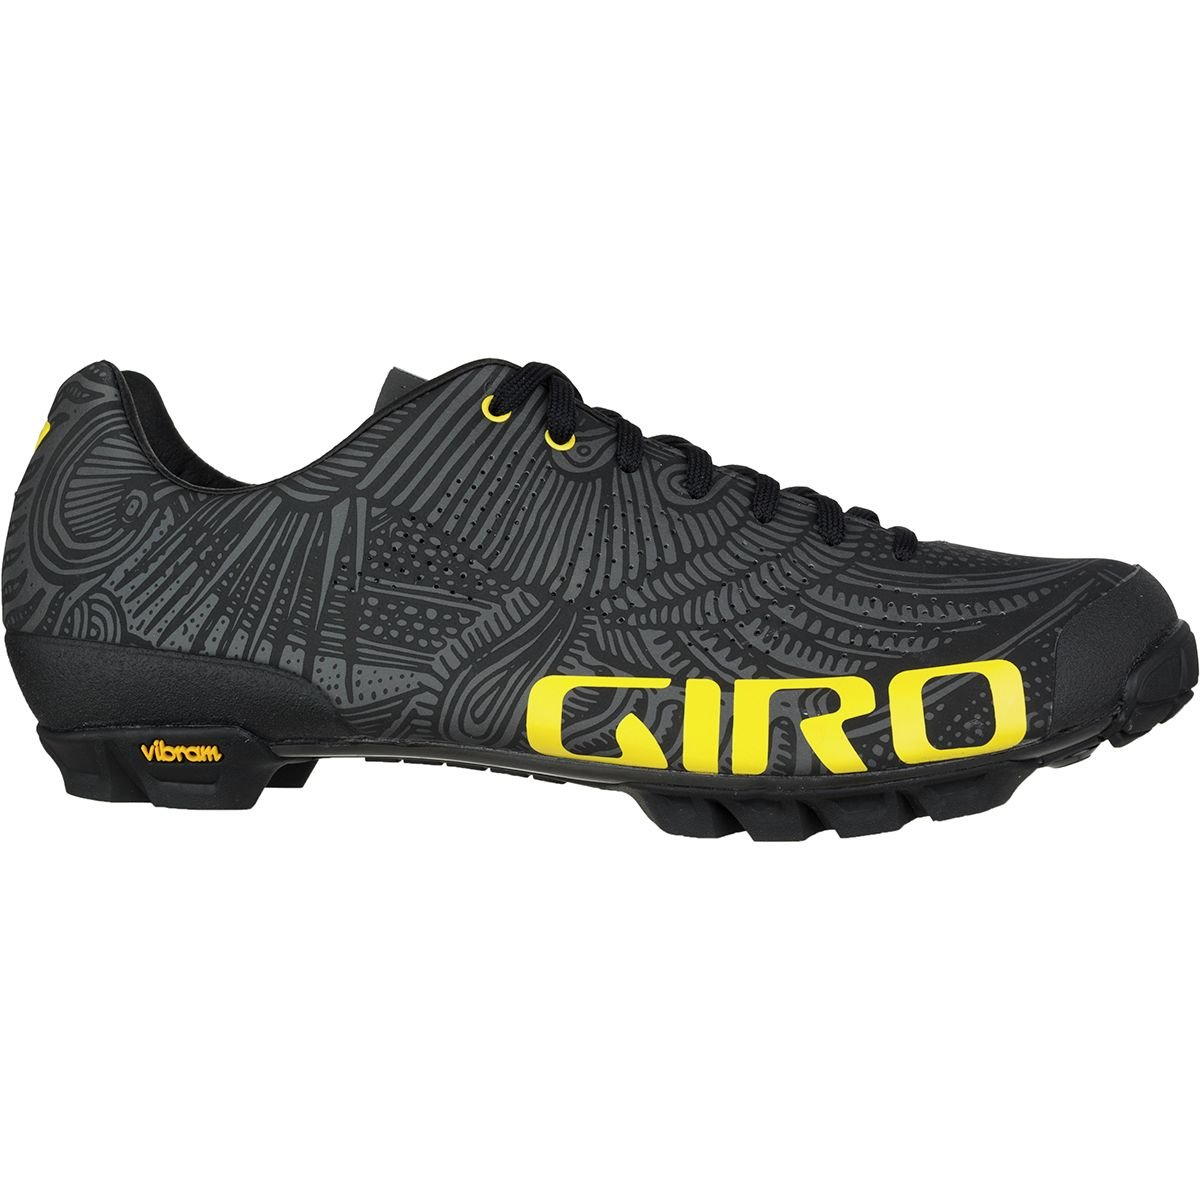 Giro Empire vr90 Arte Sempre Cycling Shoe Dark Shadow反射、45.0 – Men 's   B07BRG6GXN